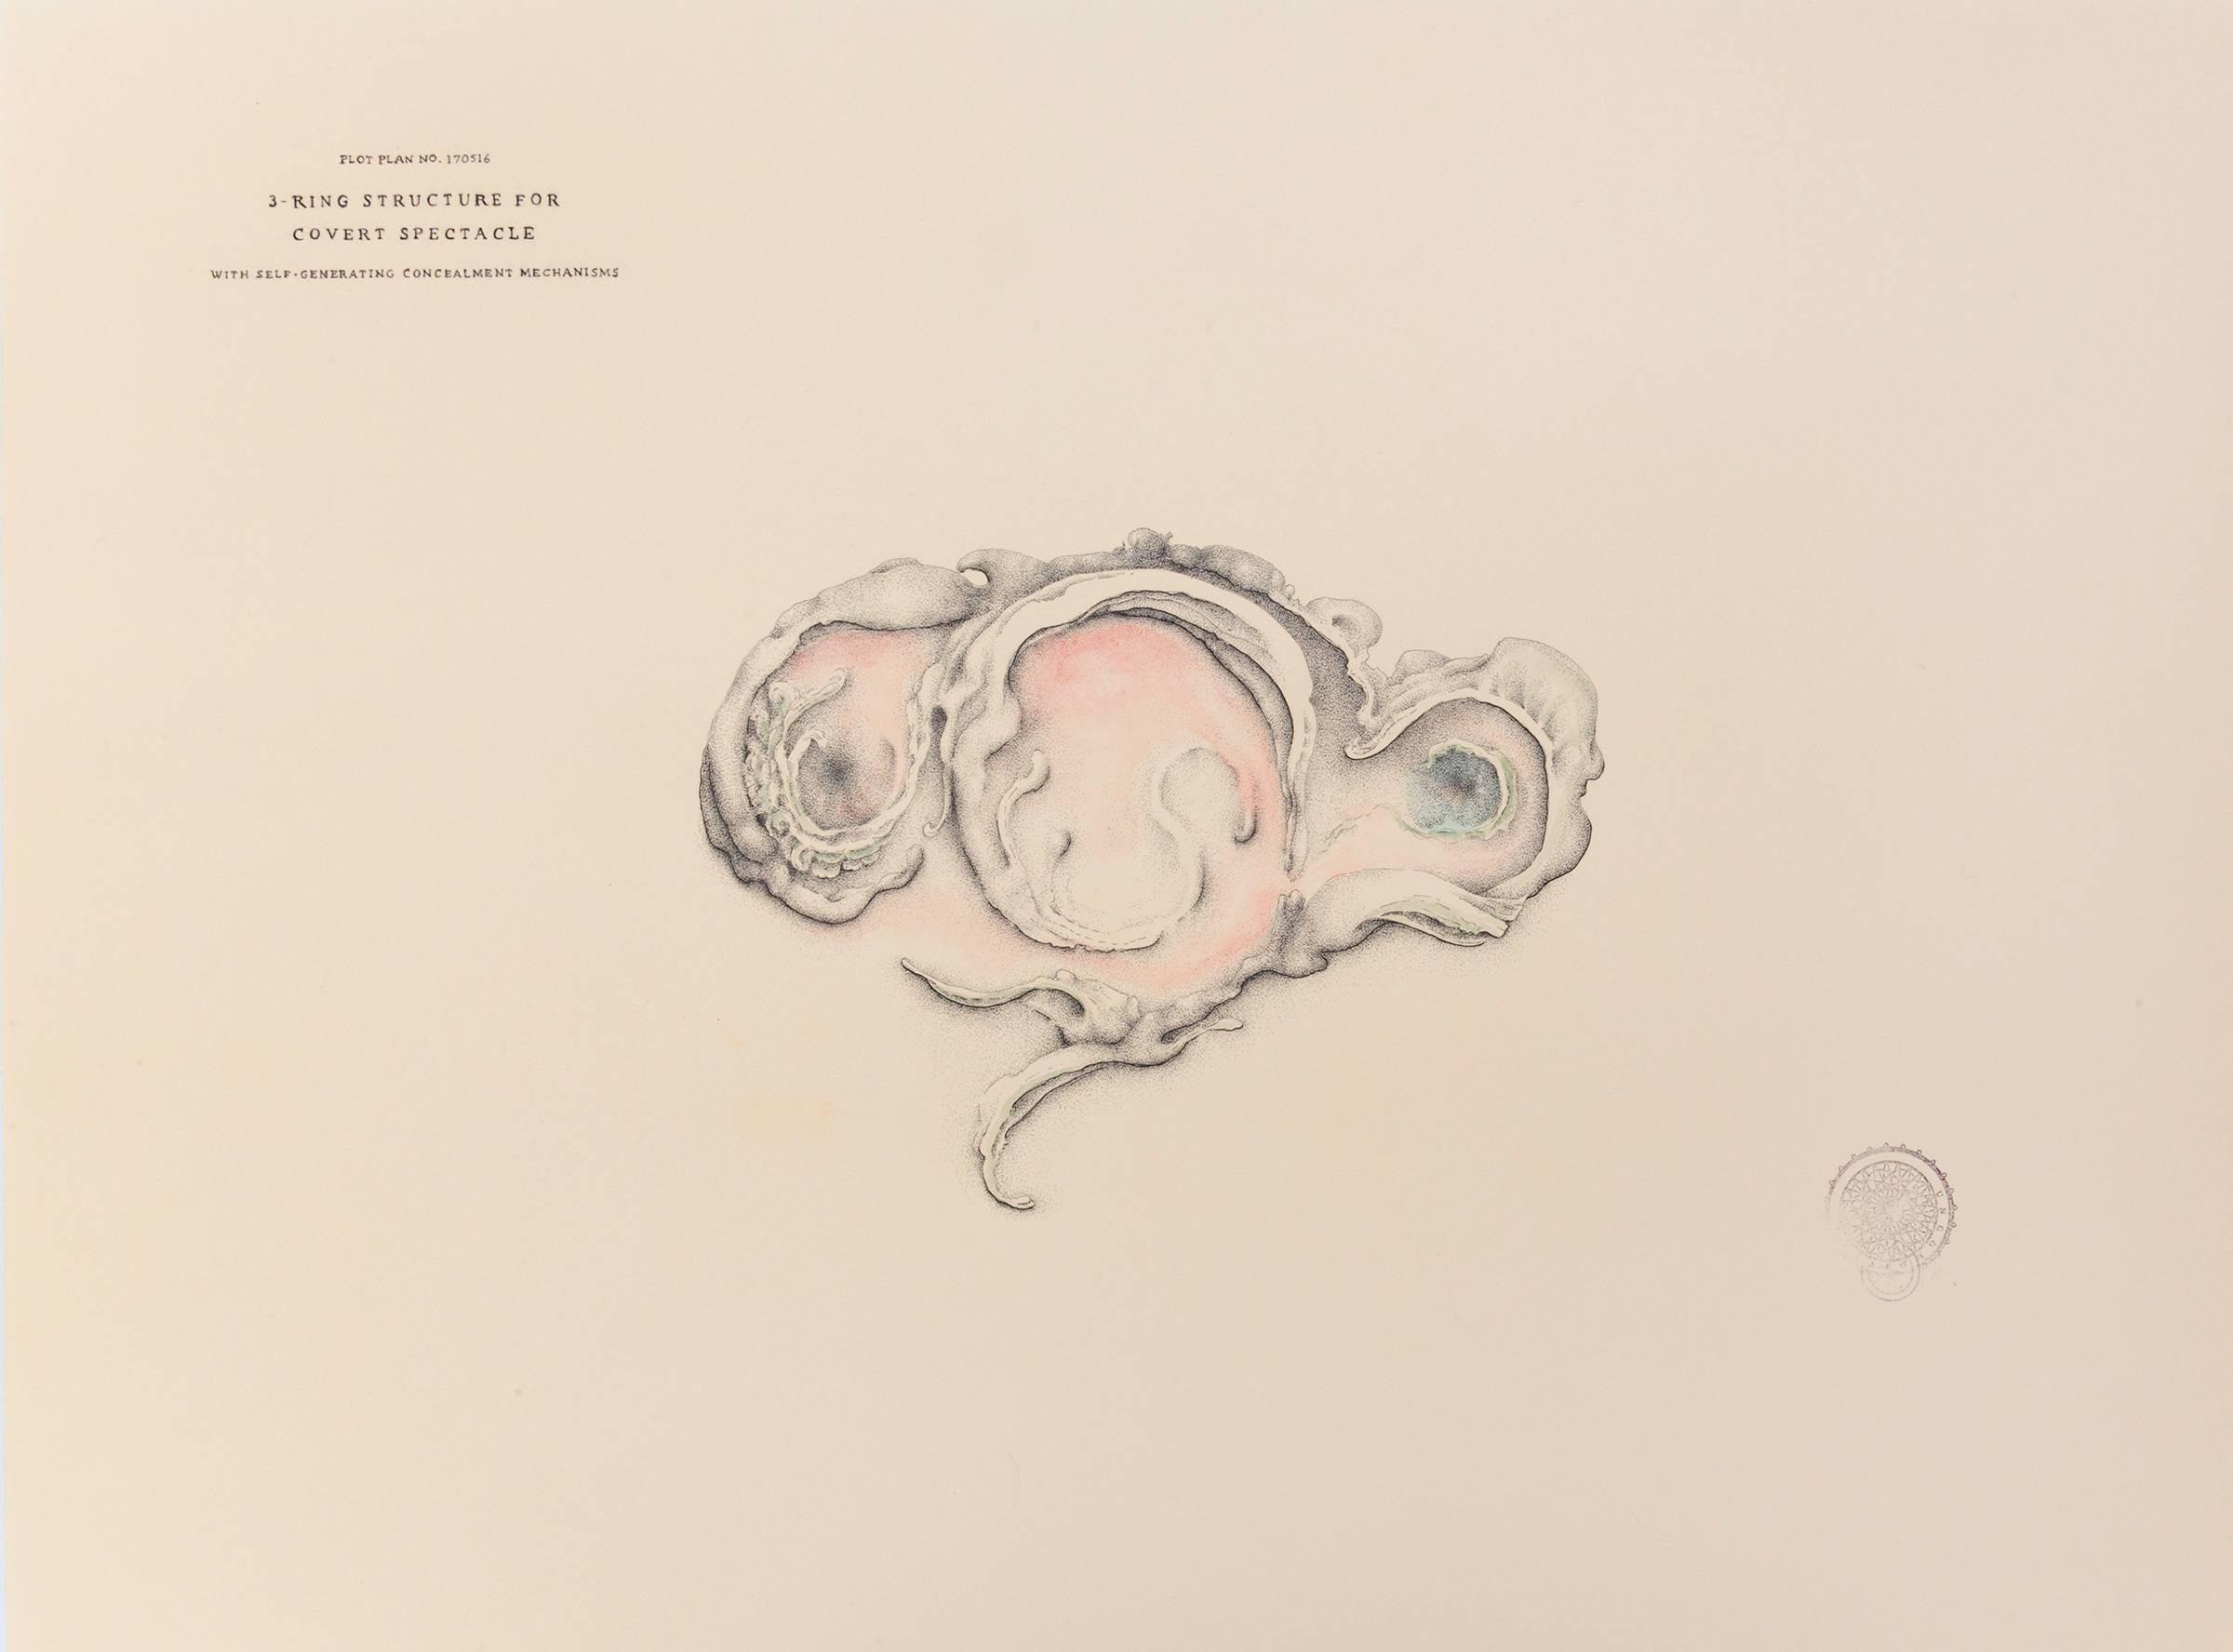 Conceptual Drawing: Plot Plan No. 170516